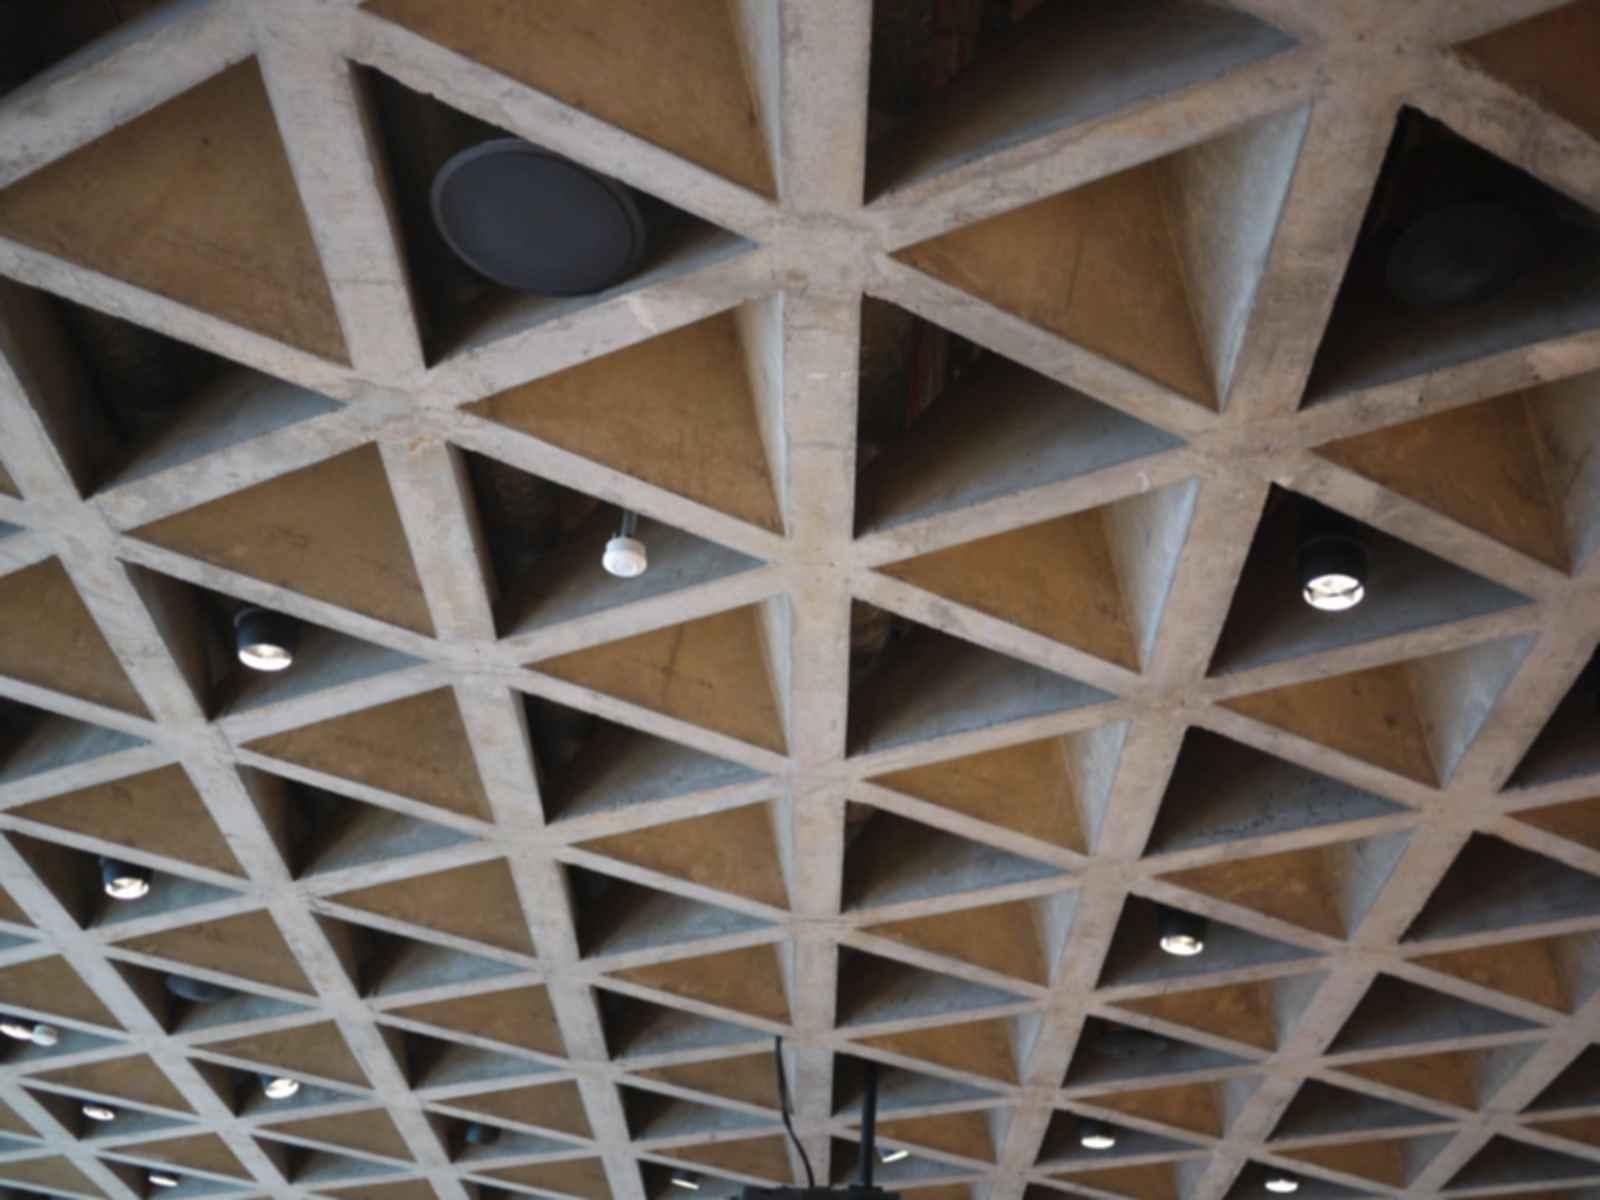 Yale University Art Gallery - Ceiling